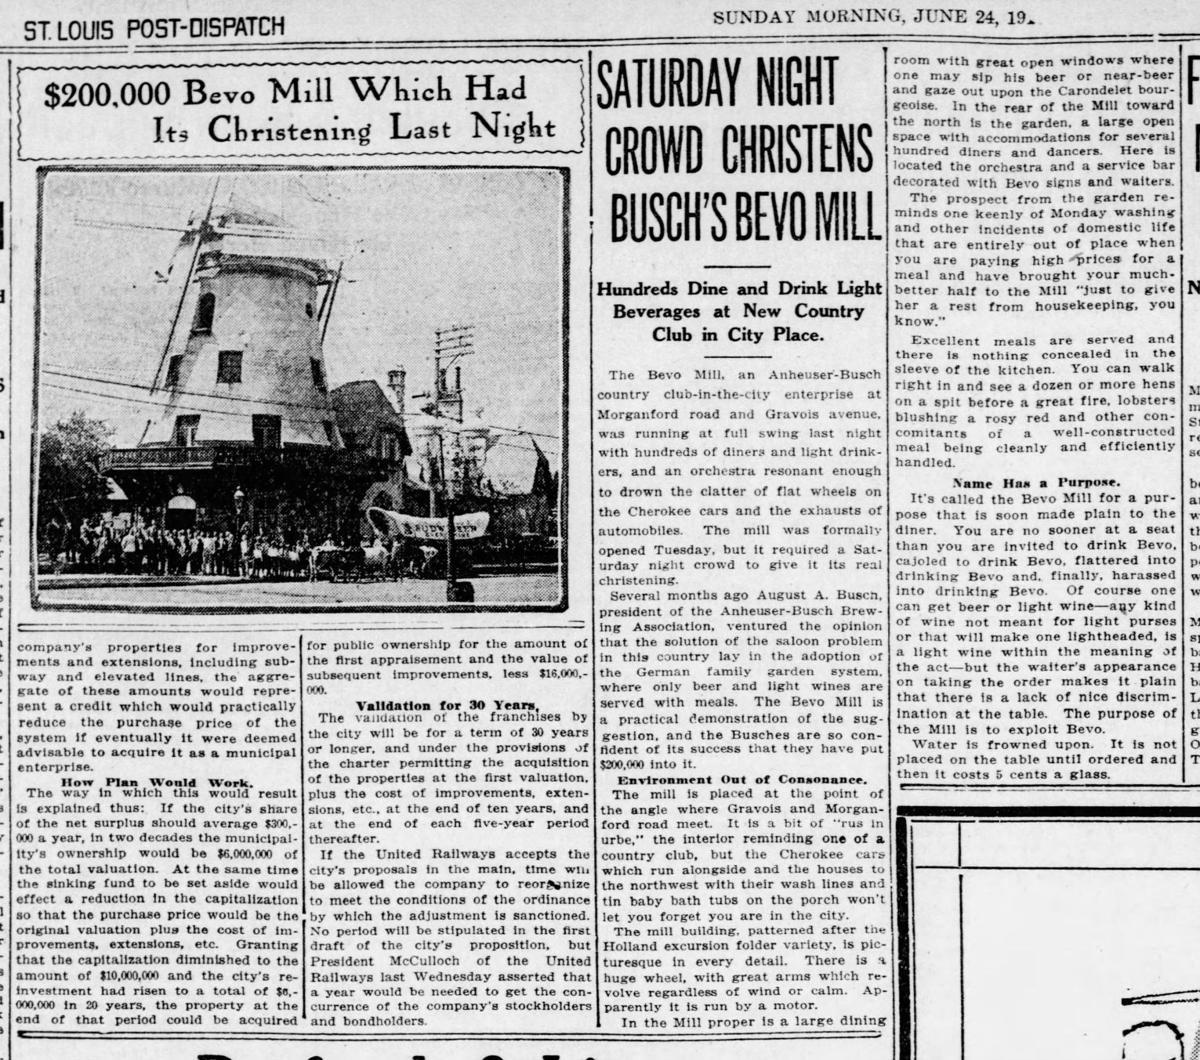 Bevo Mill opens